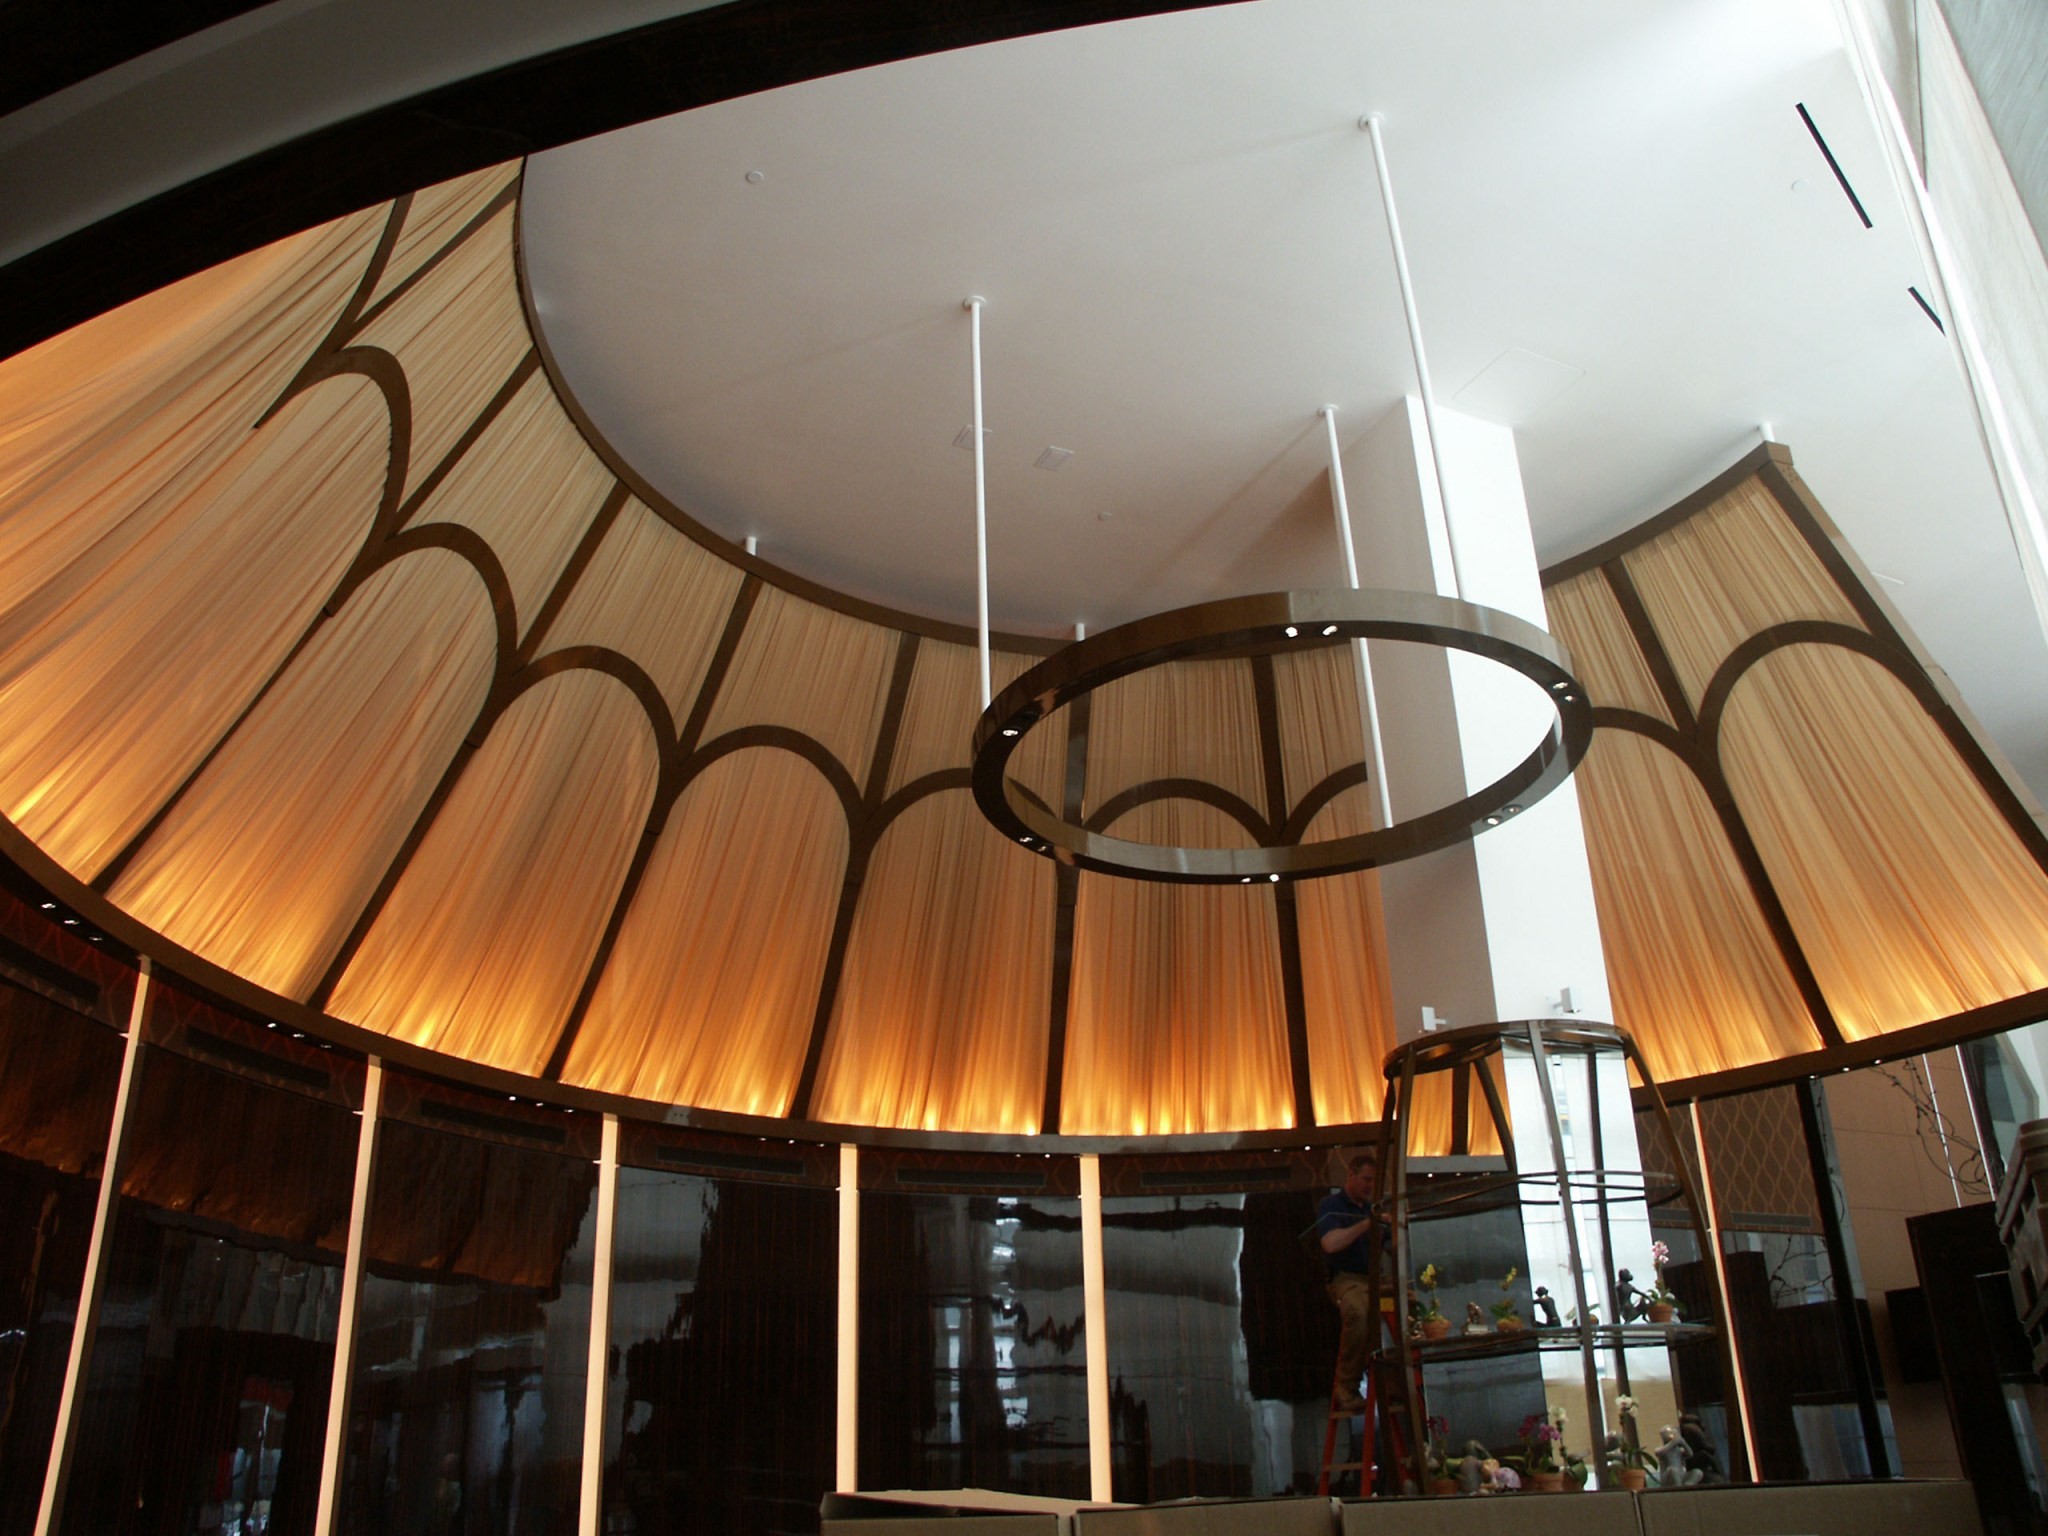 Le Cirque ceiling